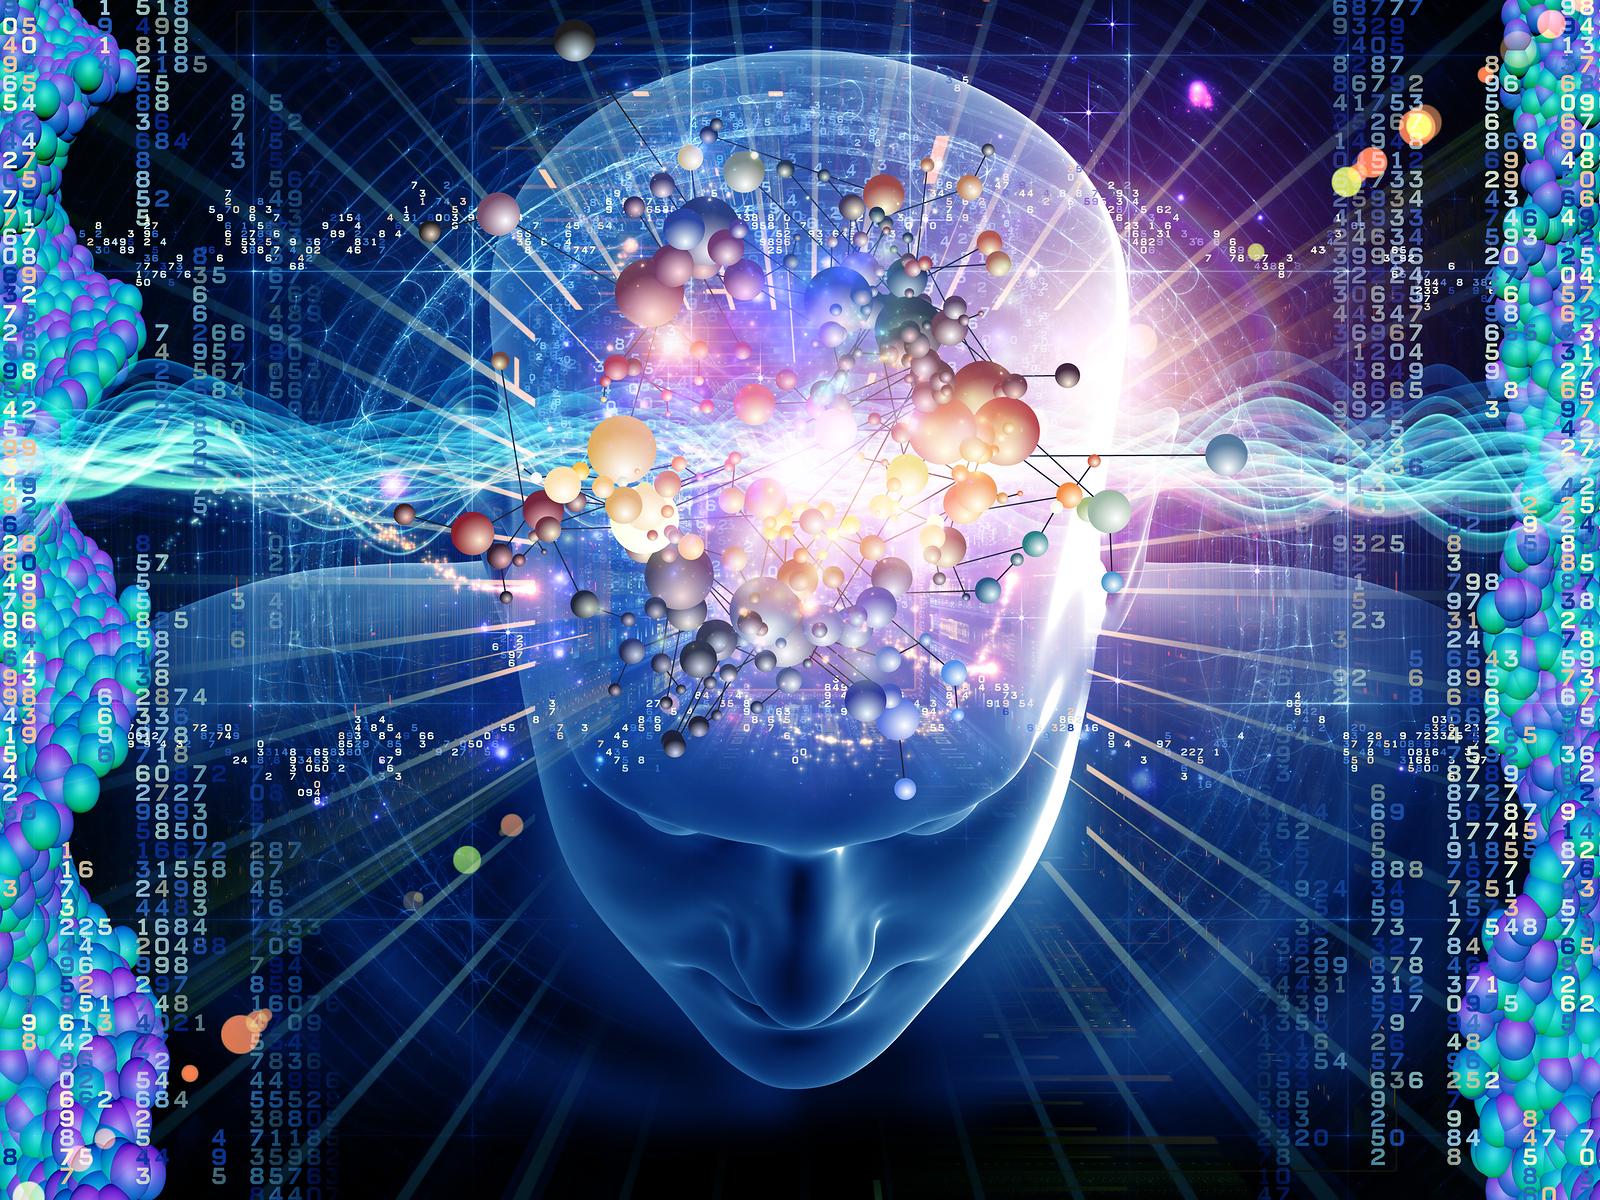 Molecular Thoughts Gazing Girl 1600x1200